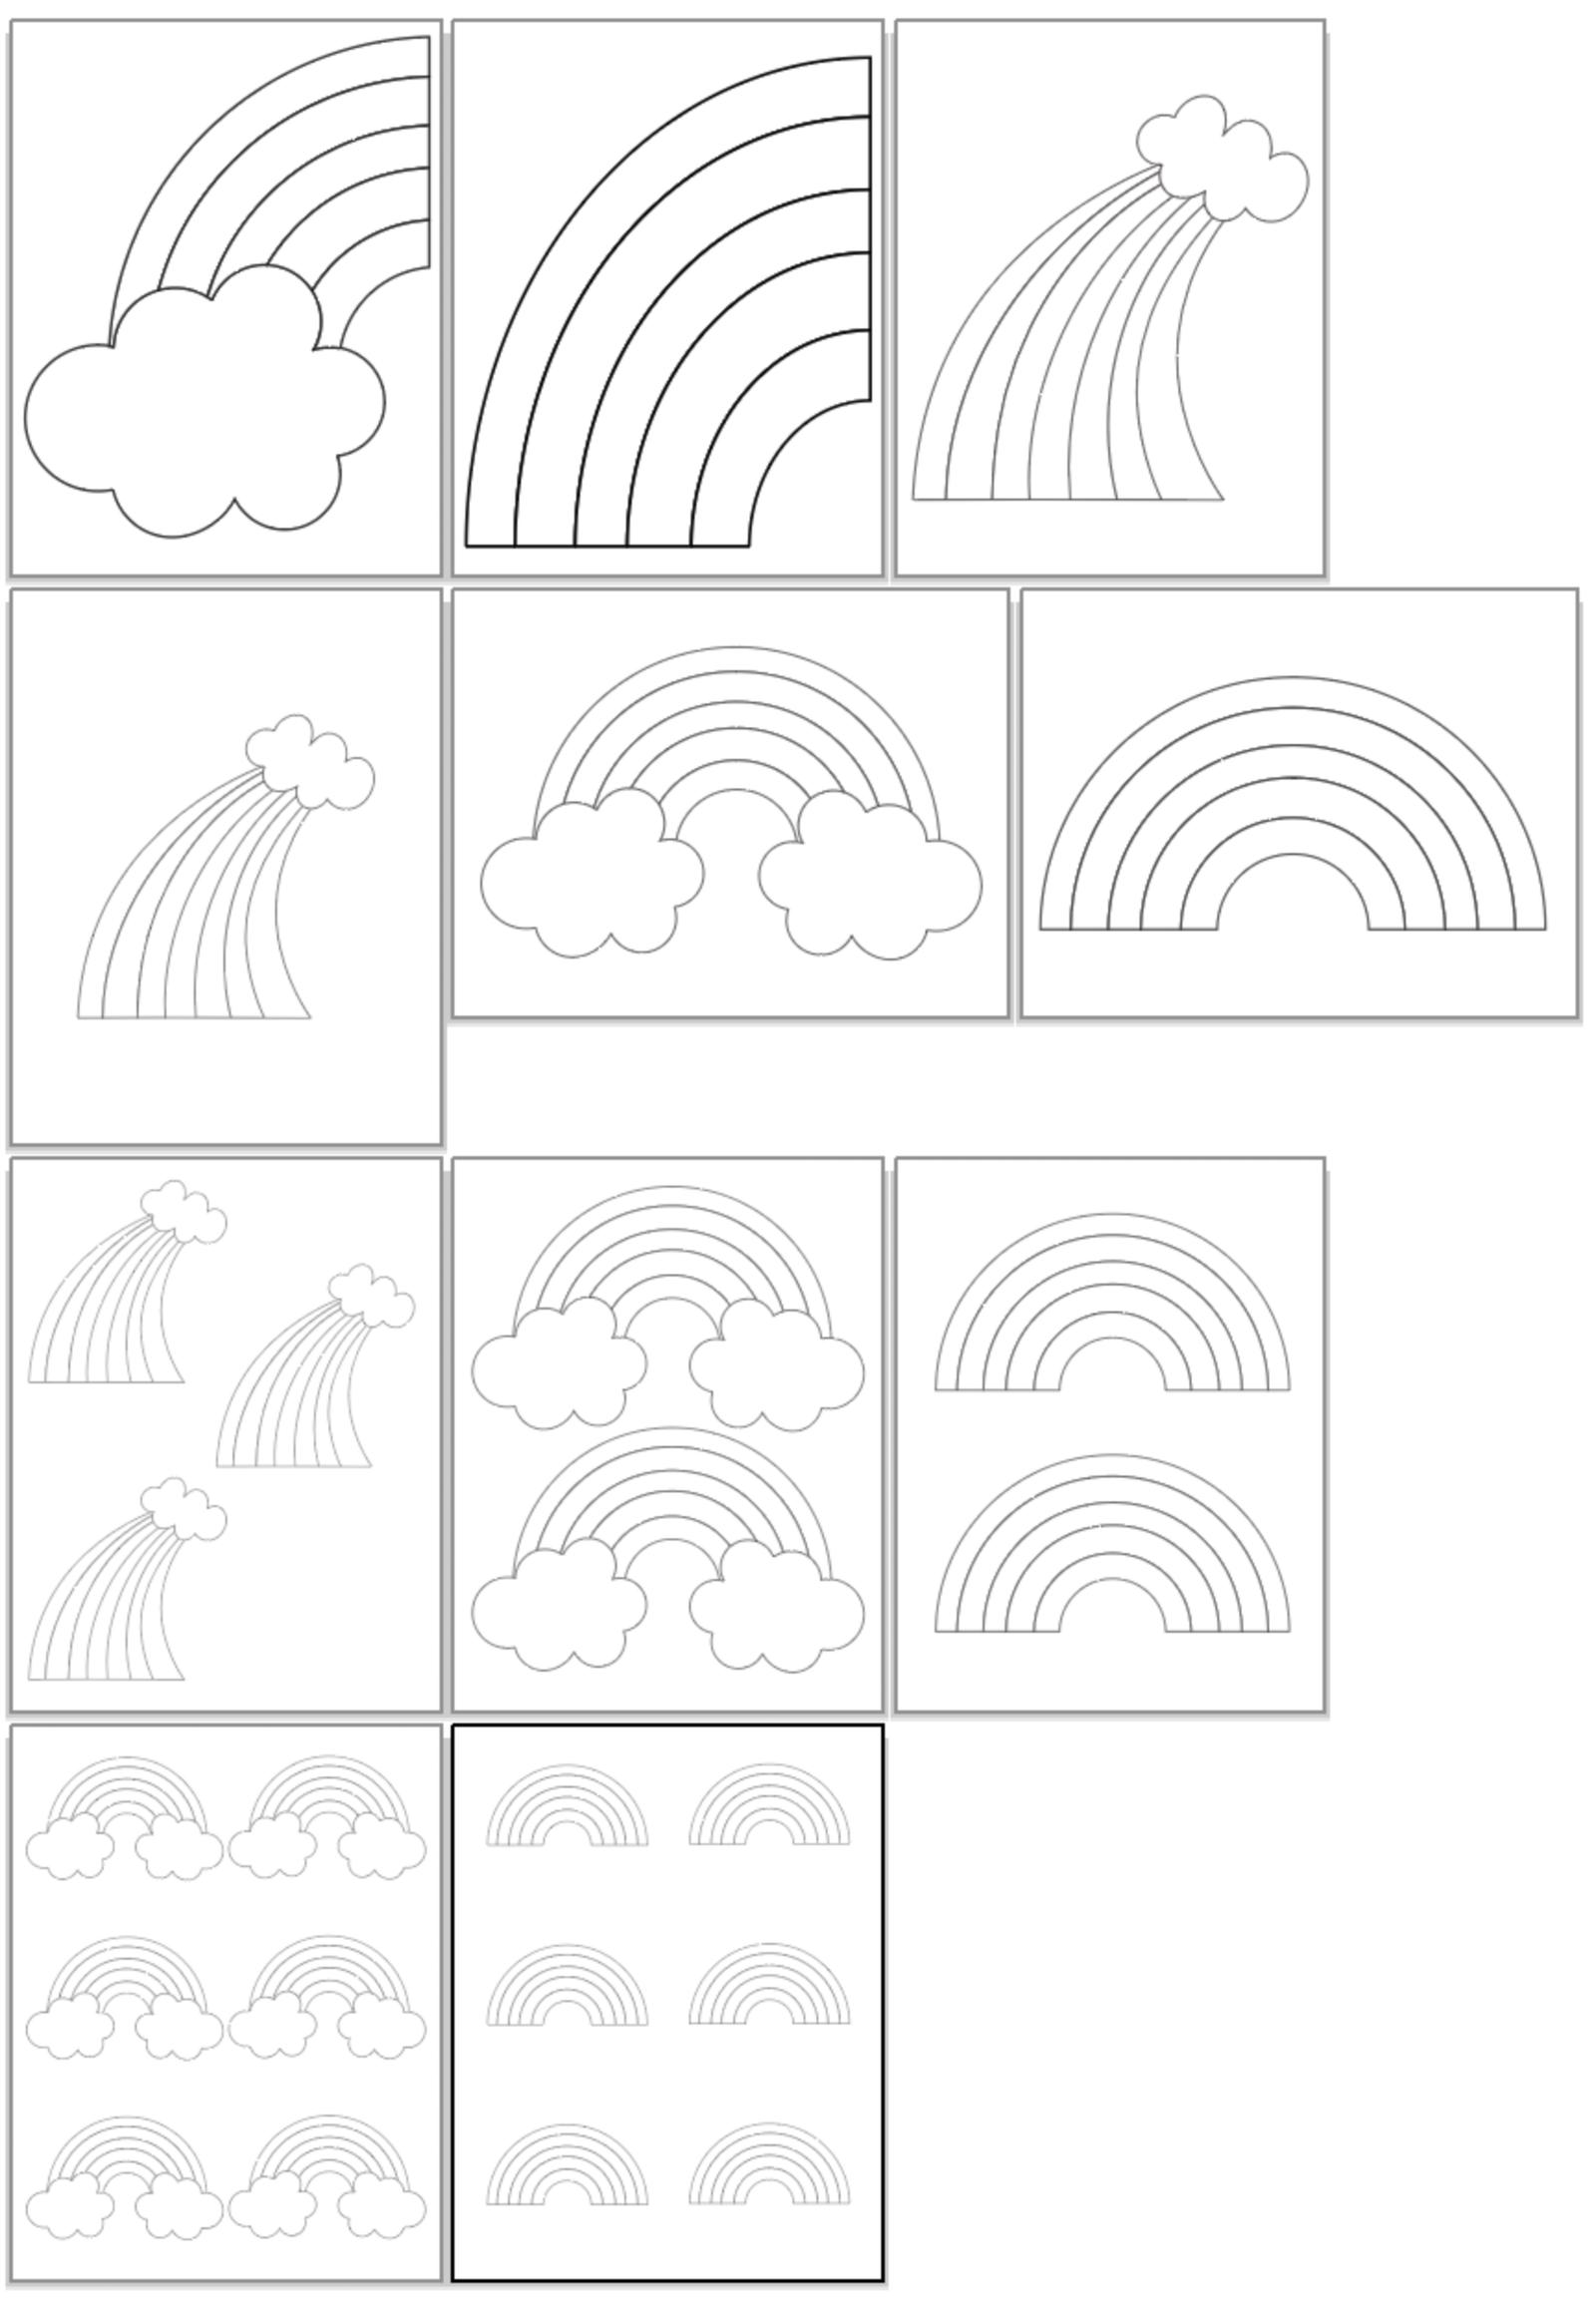 Printable Rainbow Templates in 2020